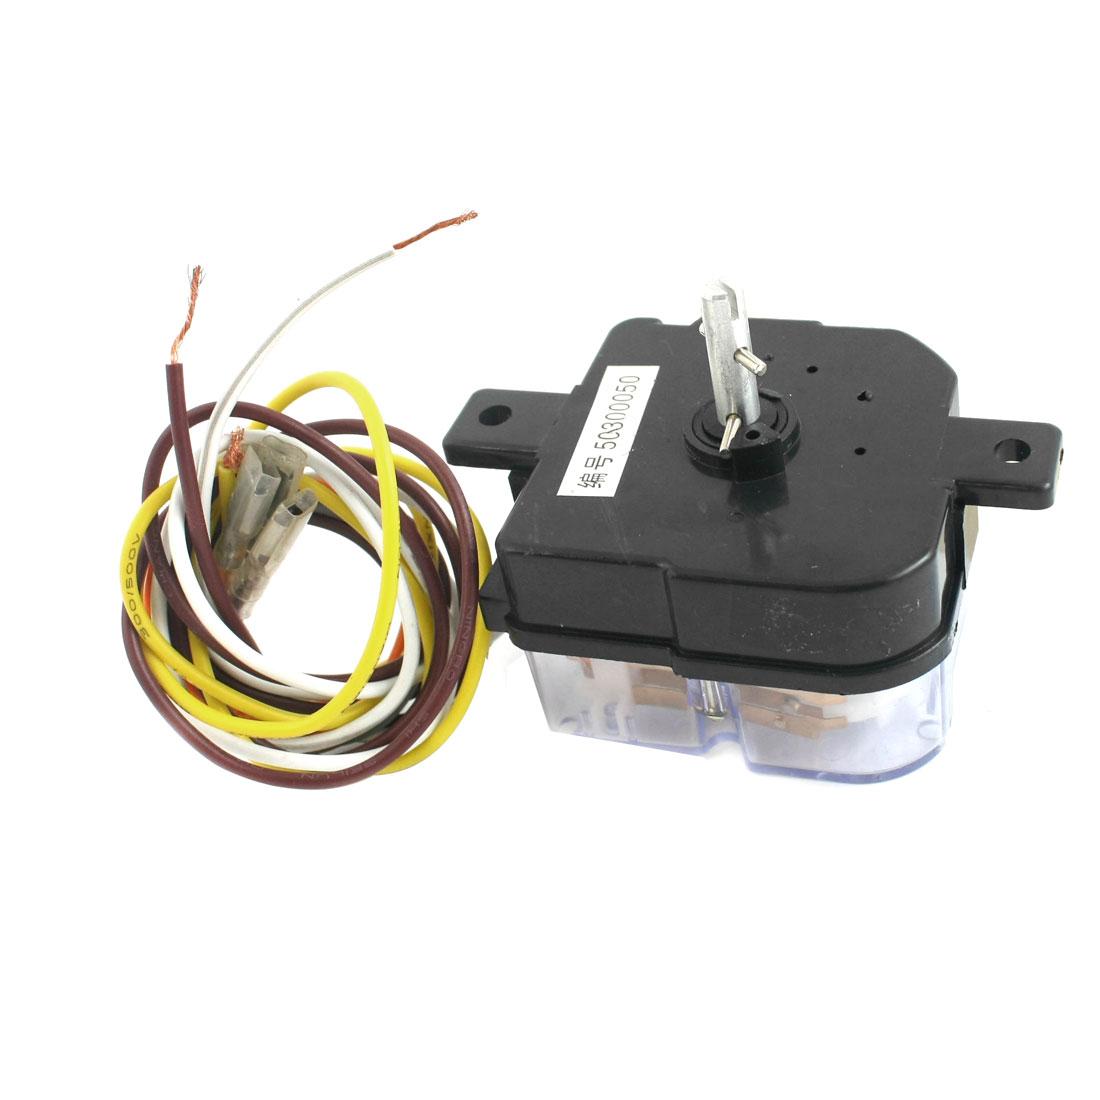 AC250V 3A 6 Wires 45 Degree Rotary Shaft Washing Machine Washer Timer Black